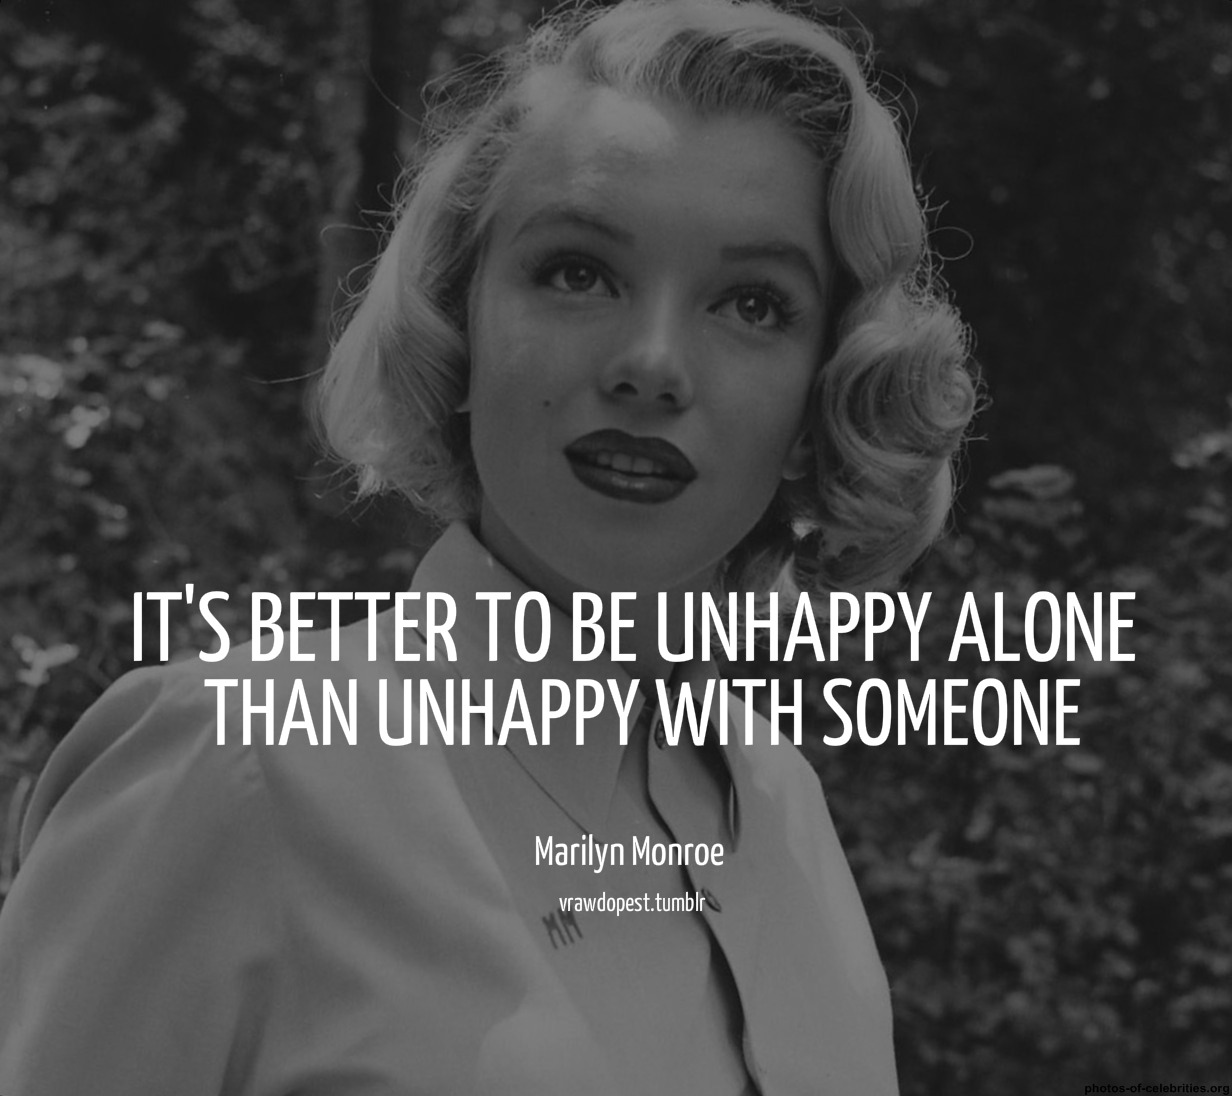 monroe tumblr Marilyn quotes